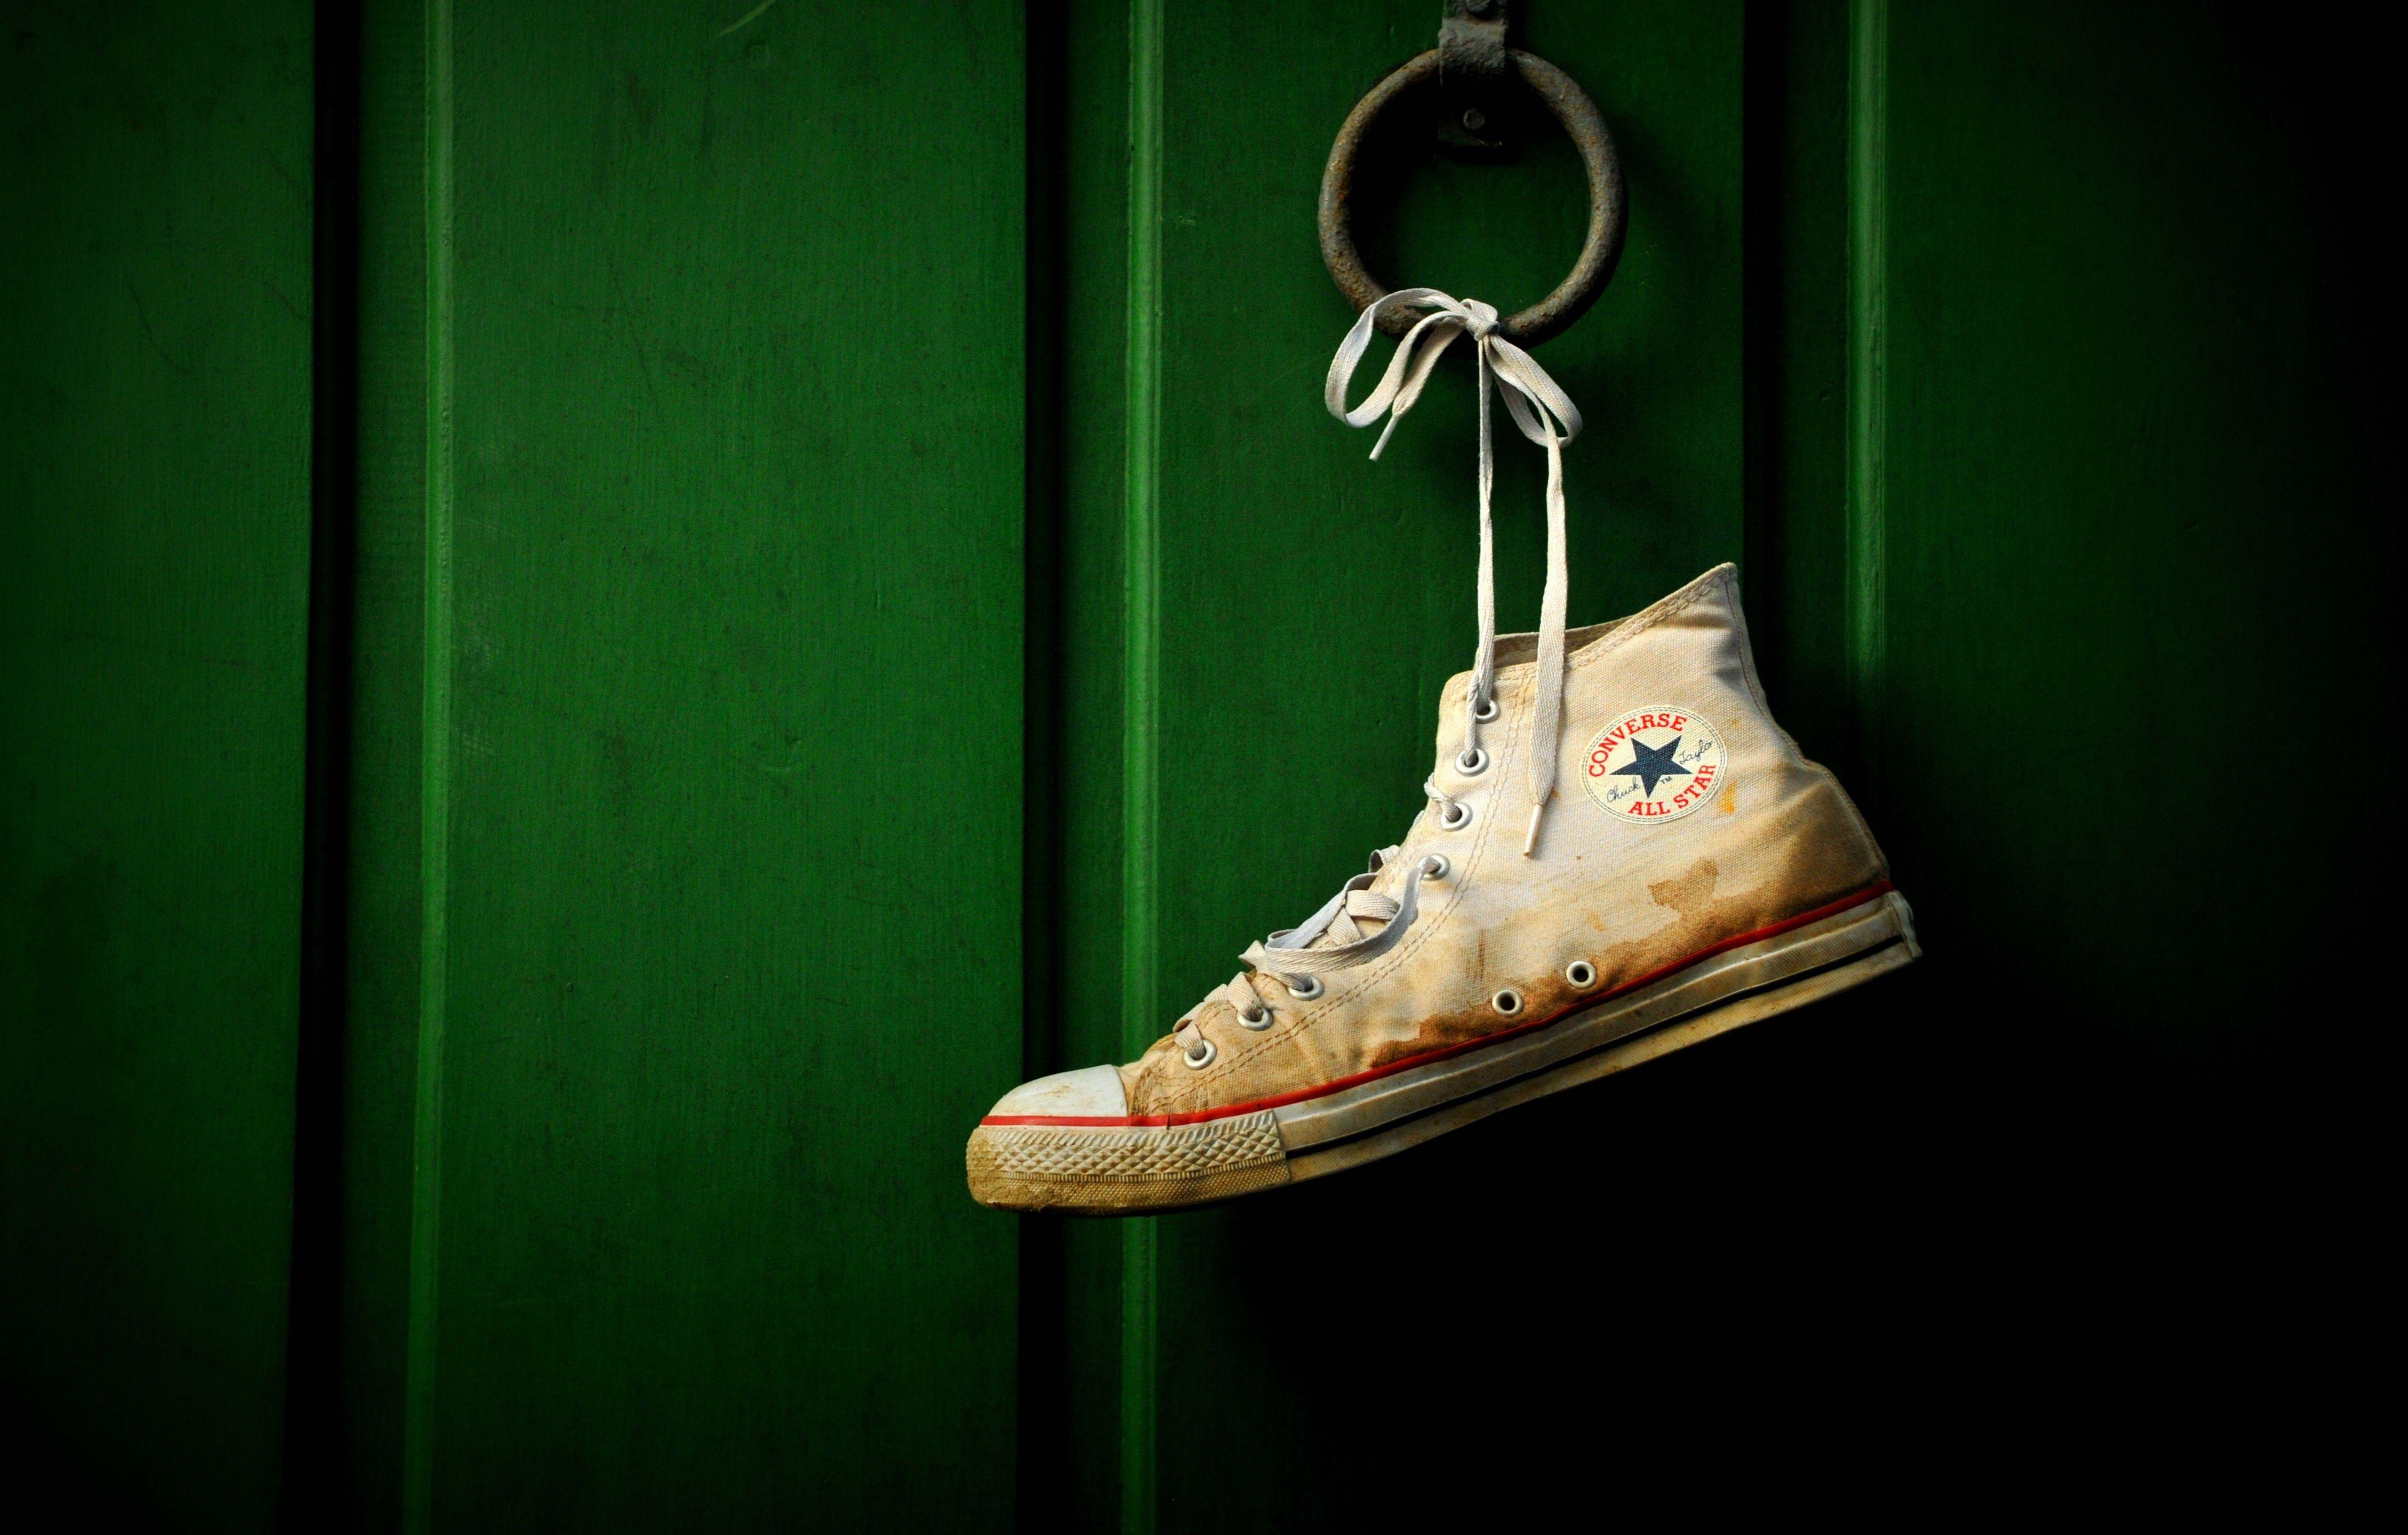 quality design cc3ff 8900c 1920x1080 Jordan Shoes Wallpaper - QyGjxZ